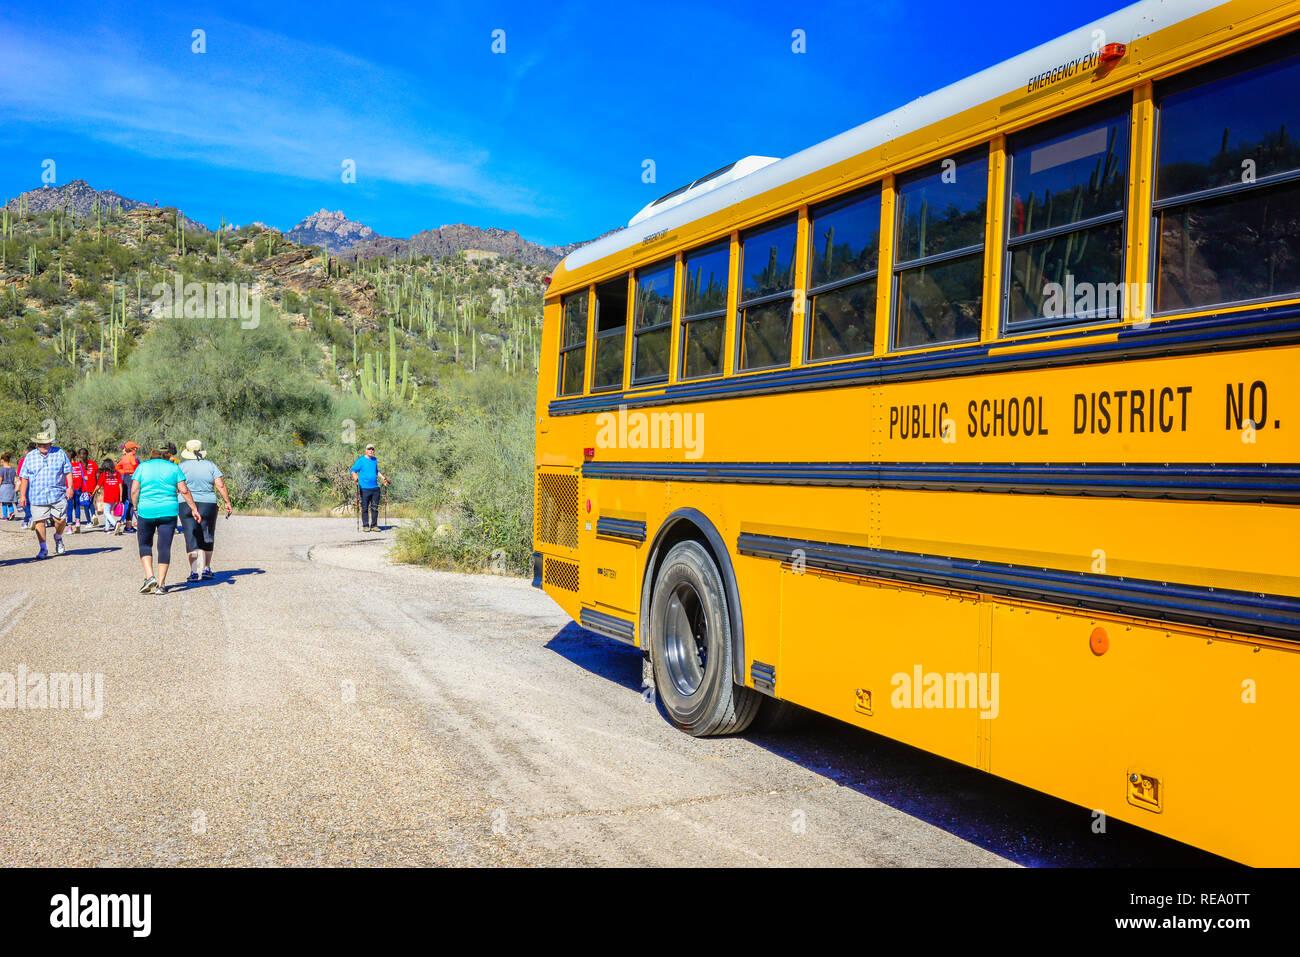 Usa Landscape Bus Stock Photos & Usa Landscape Bus Stock